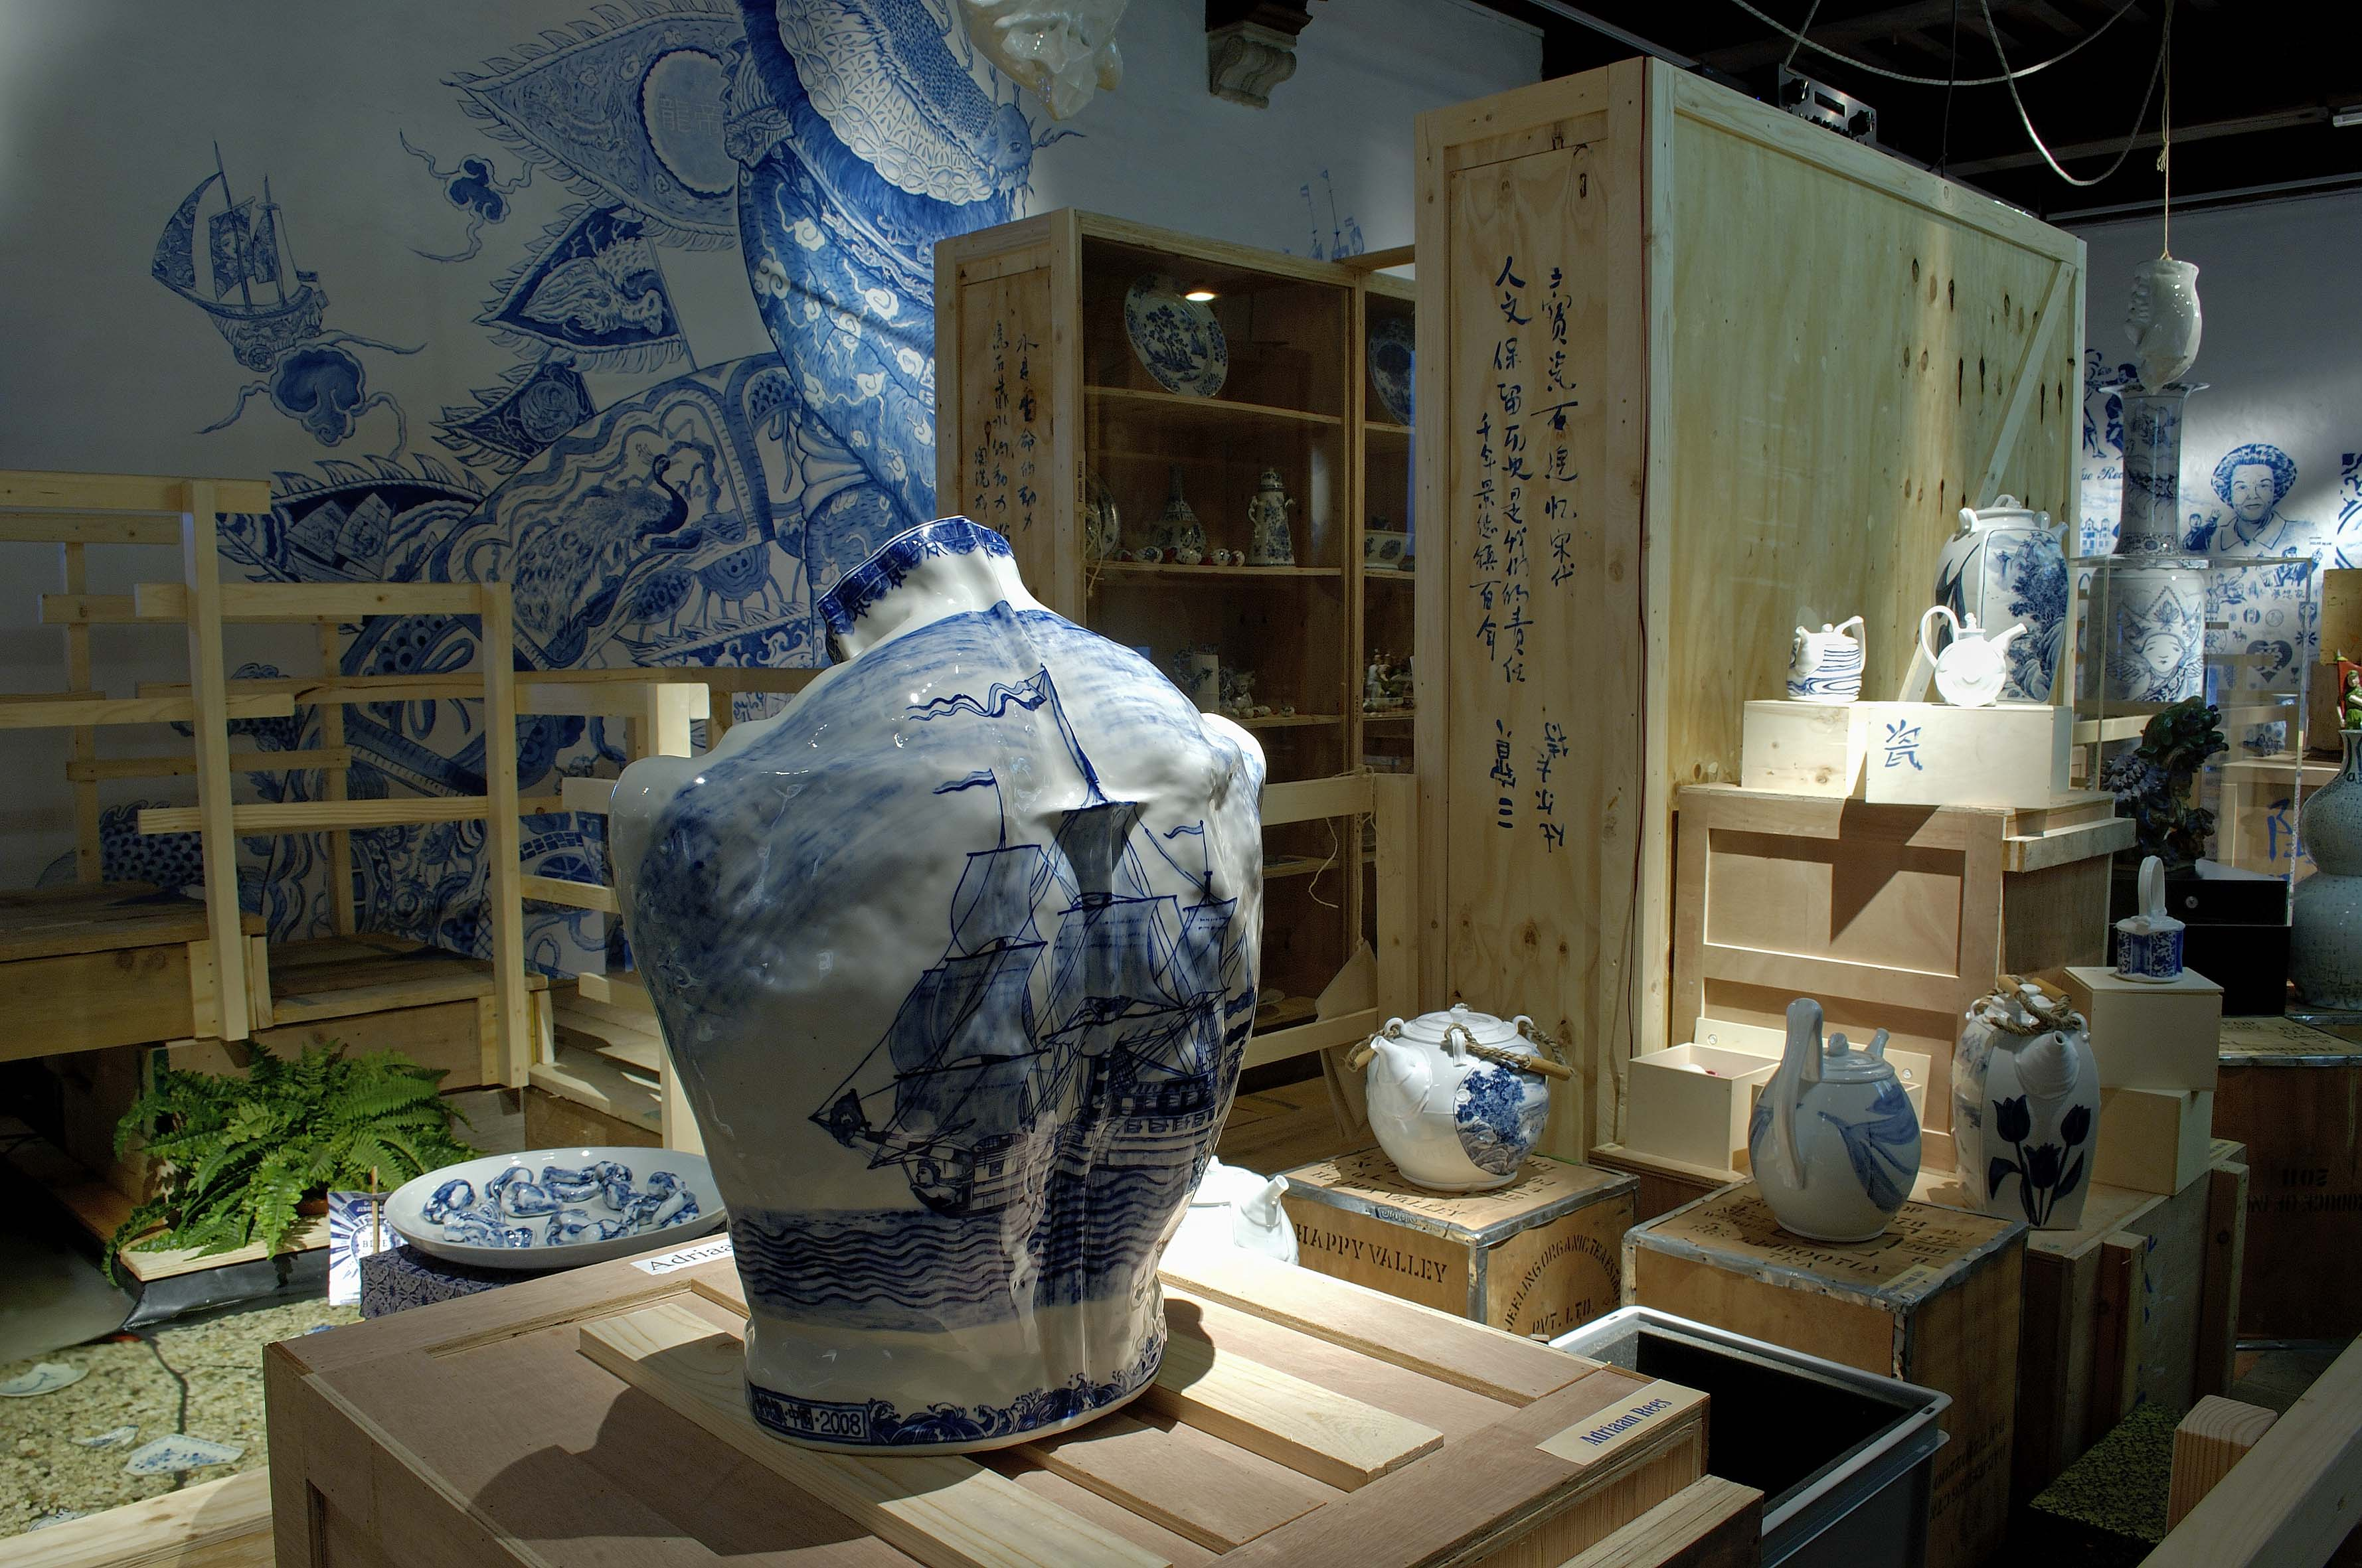 Museum Prinsenhof - Blue Revolution Foto Ron Zijlstra 2013